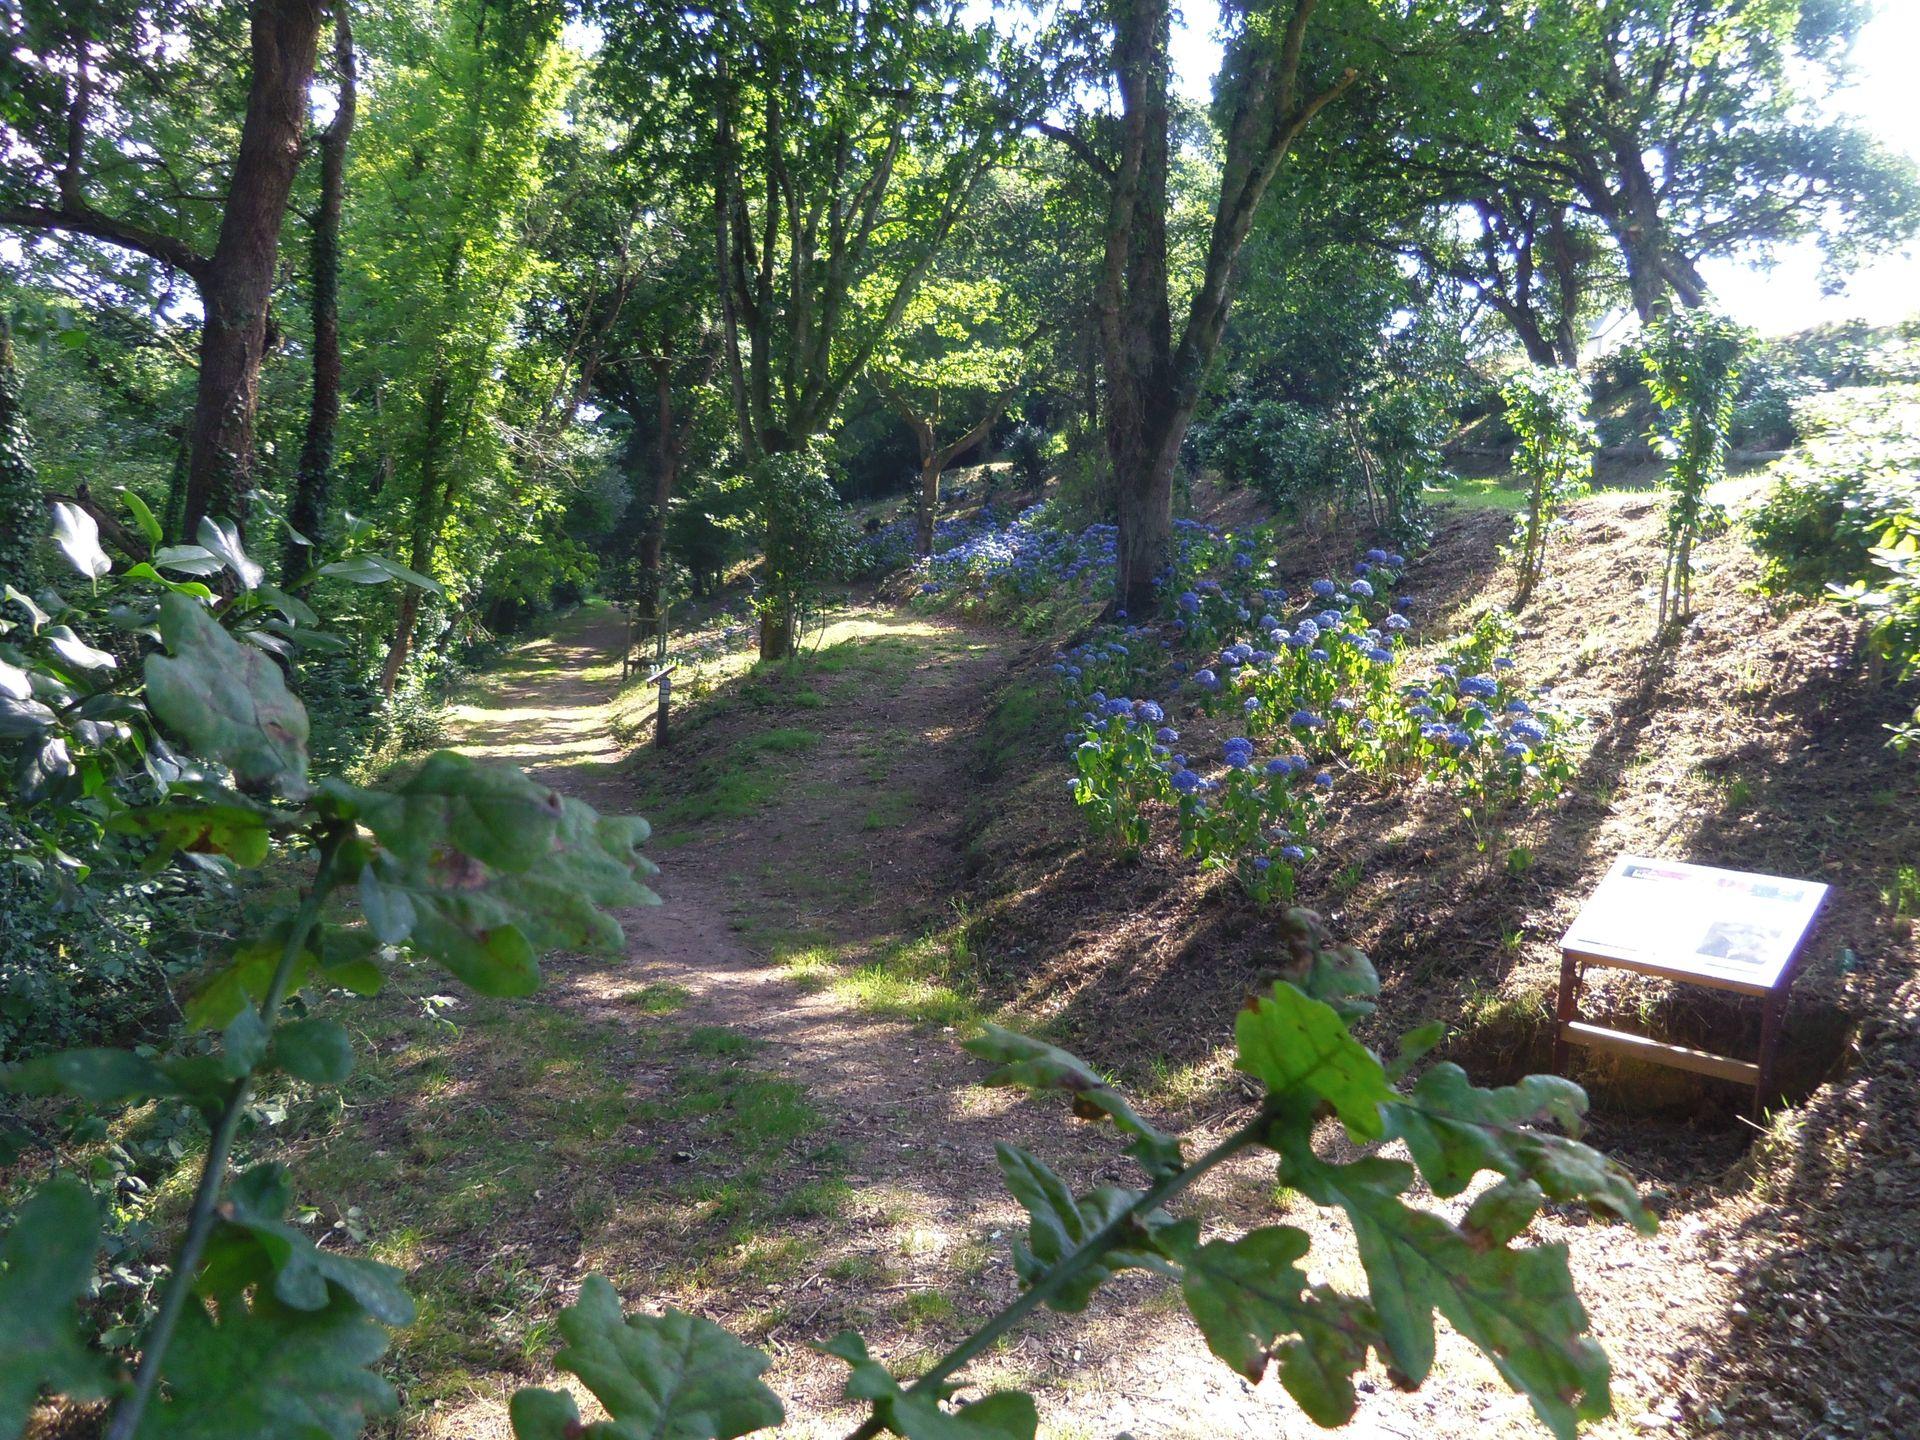 Chemin aux hortensias 1